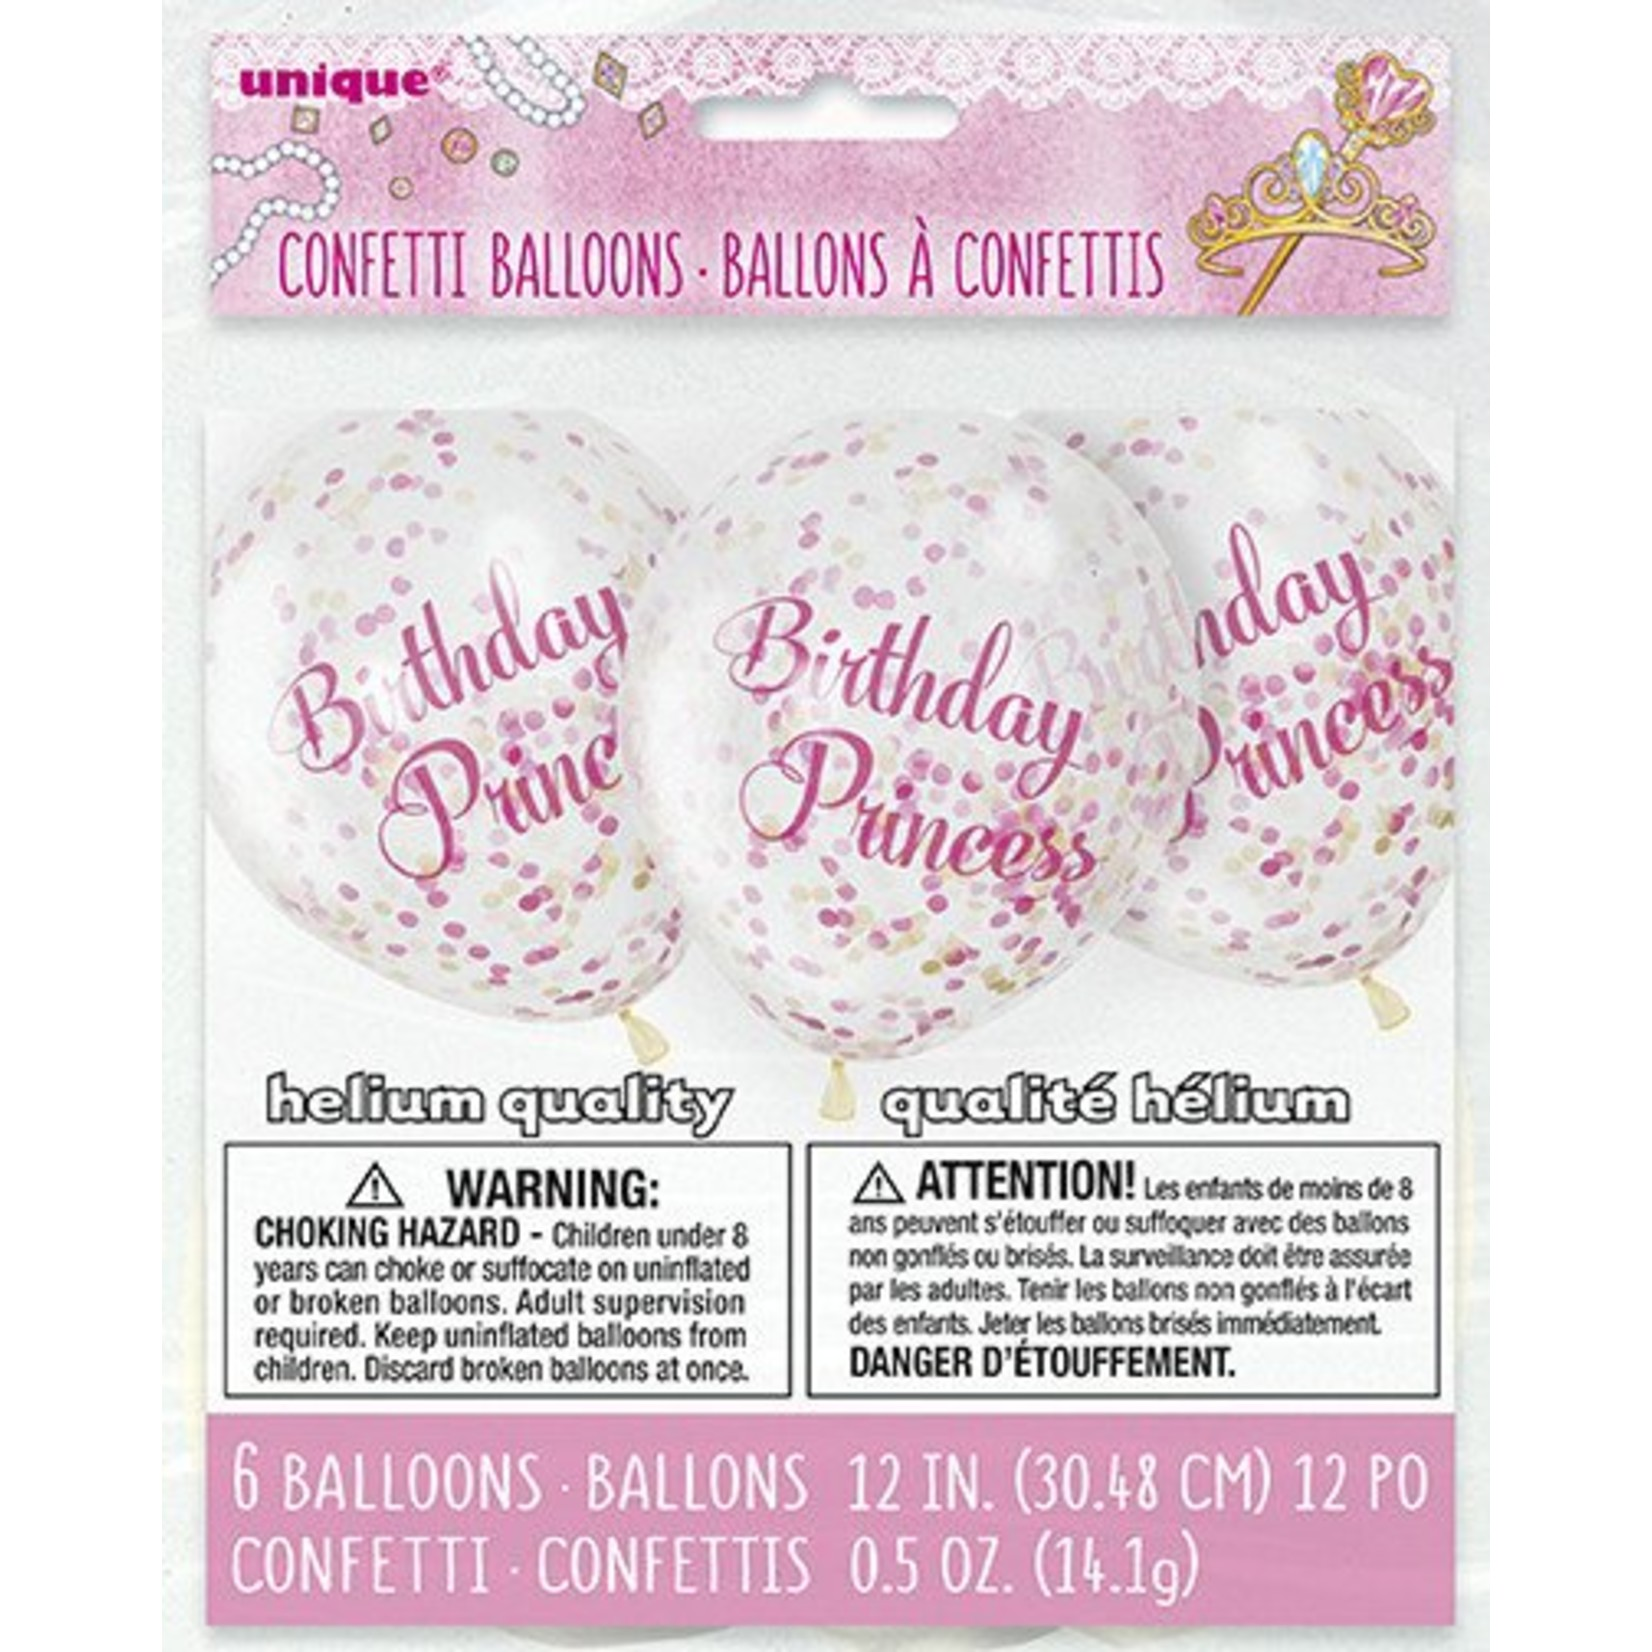 "Balloons - Lates- Birthday Princess with Confetti -12"" (6PK) Biodegradable"